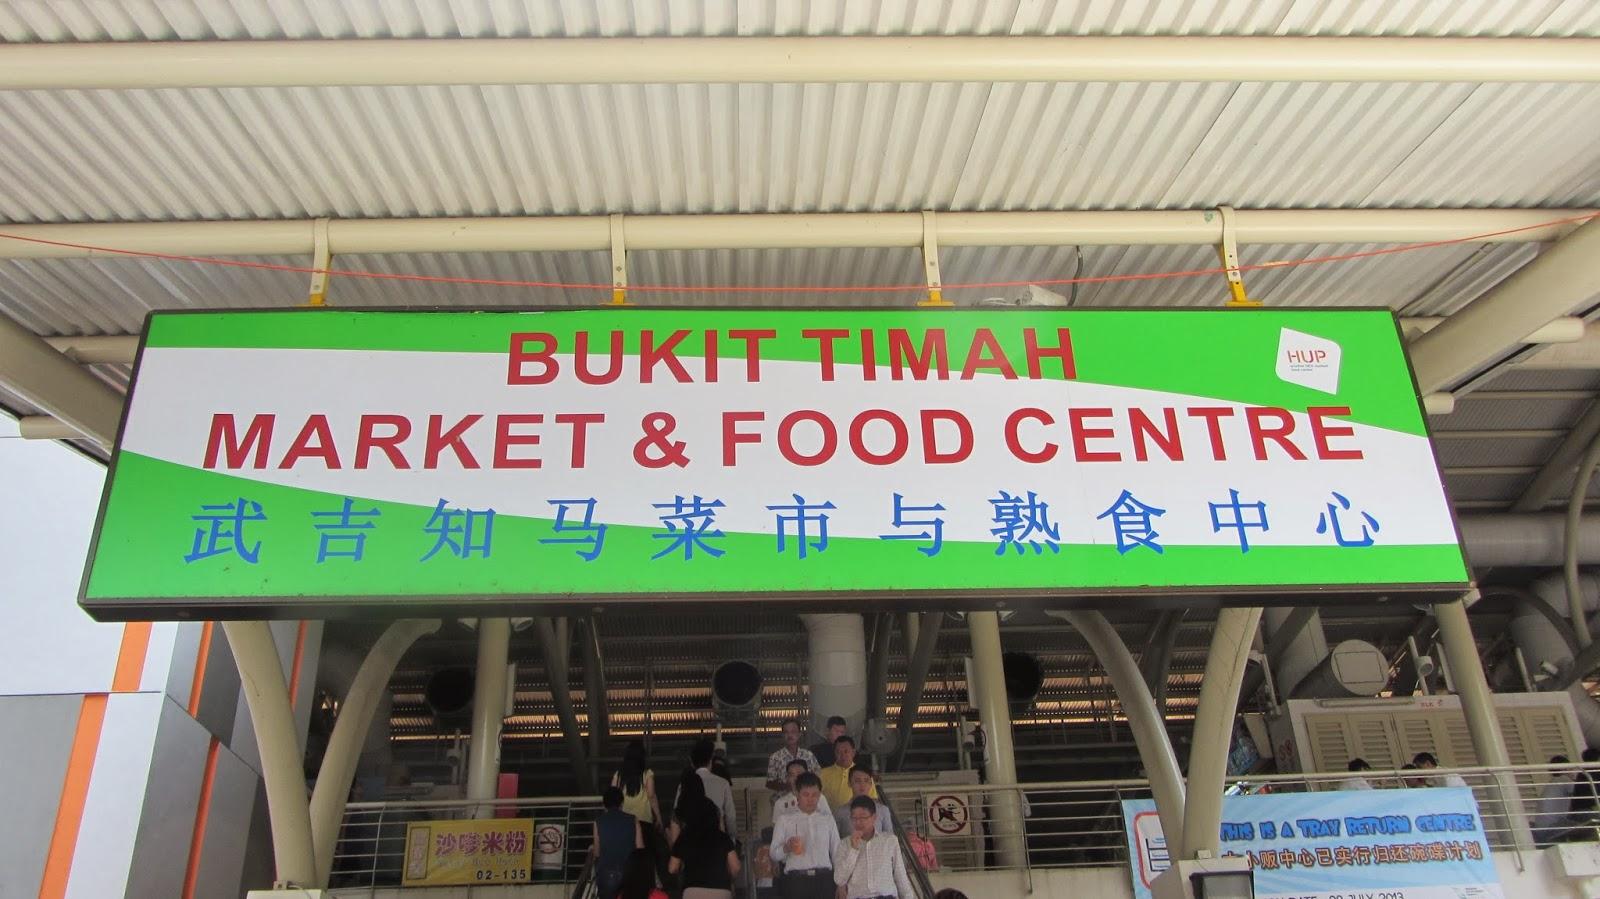 Mayfair Modern is near to Bukit Timah Food Centre